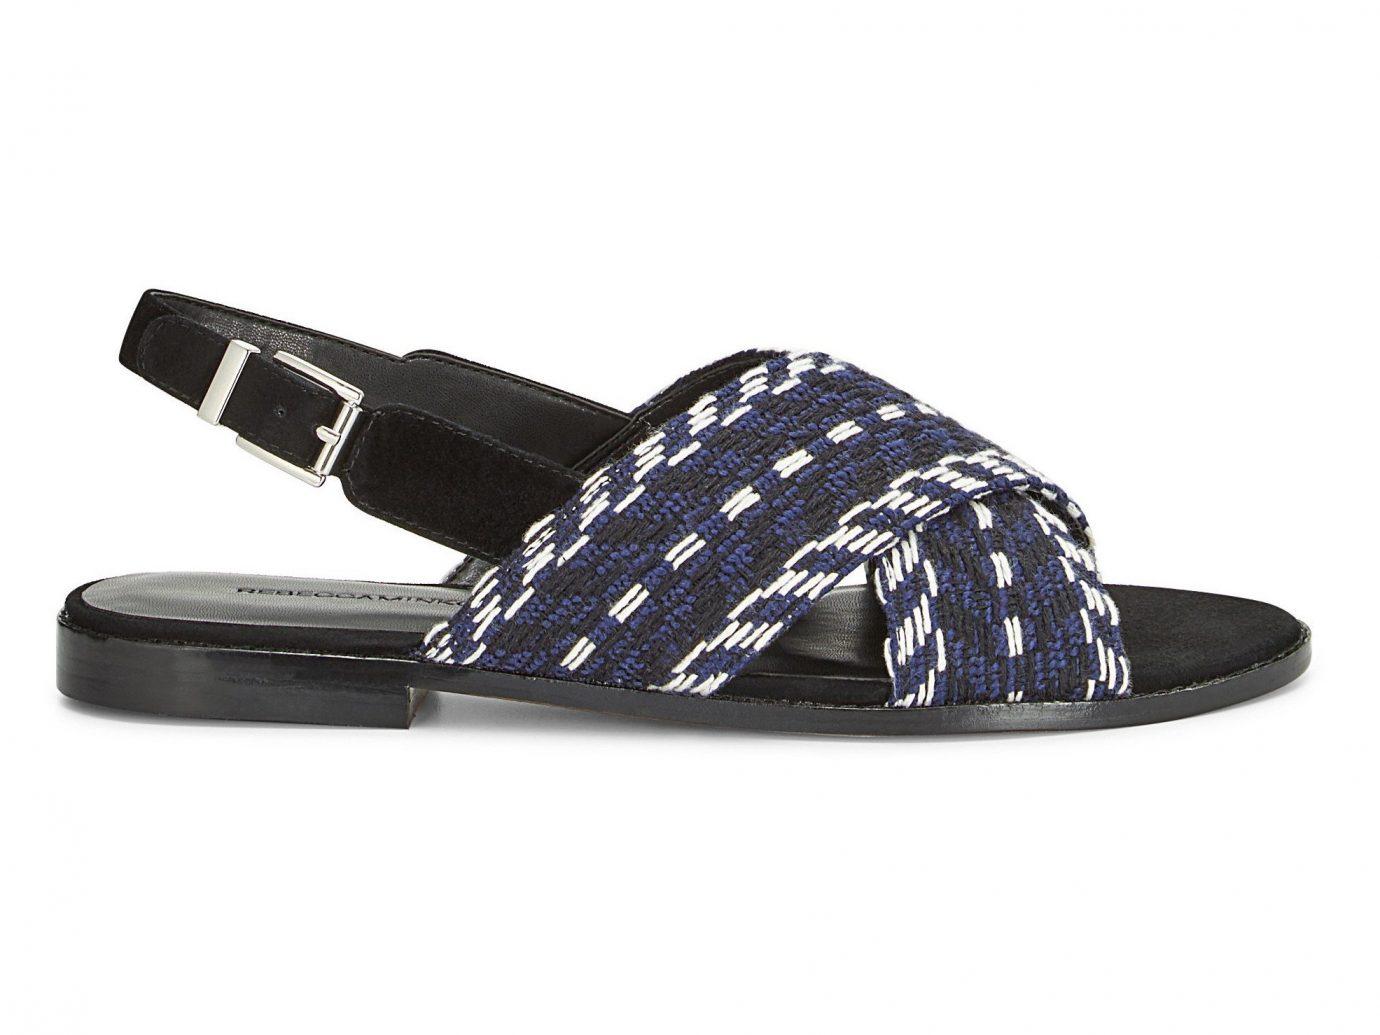 Style + Design footwear shoe sandal product outdoor shoe slide sandal electric blue product design walking shoe pattern feet